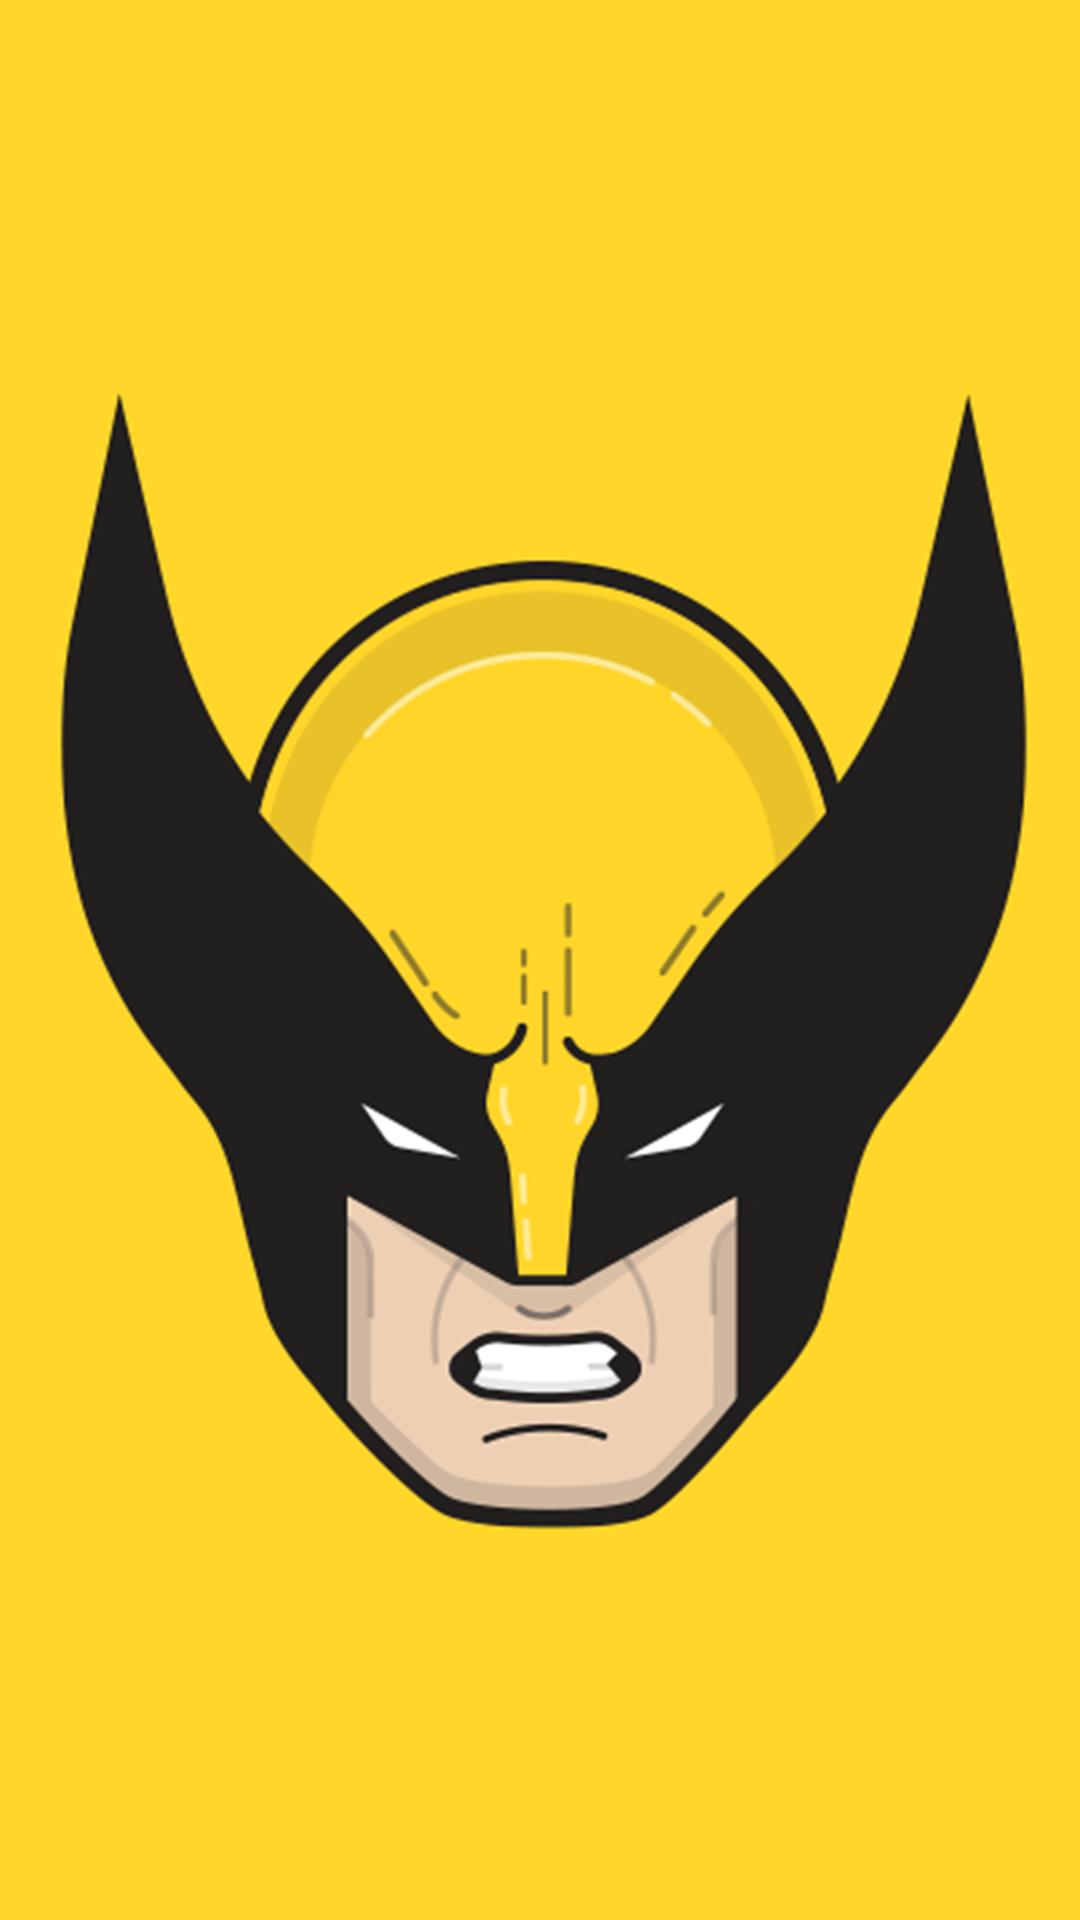 Wallpaper Illustration Logo Wolverine Cartoon Superhero Head